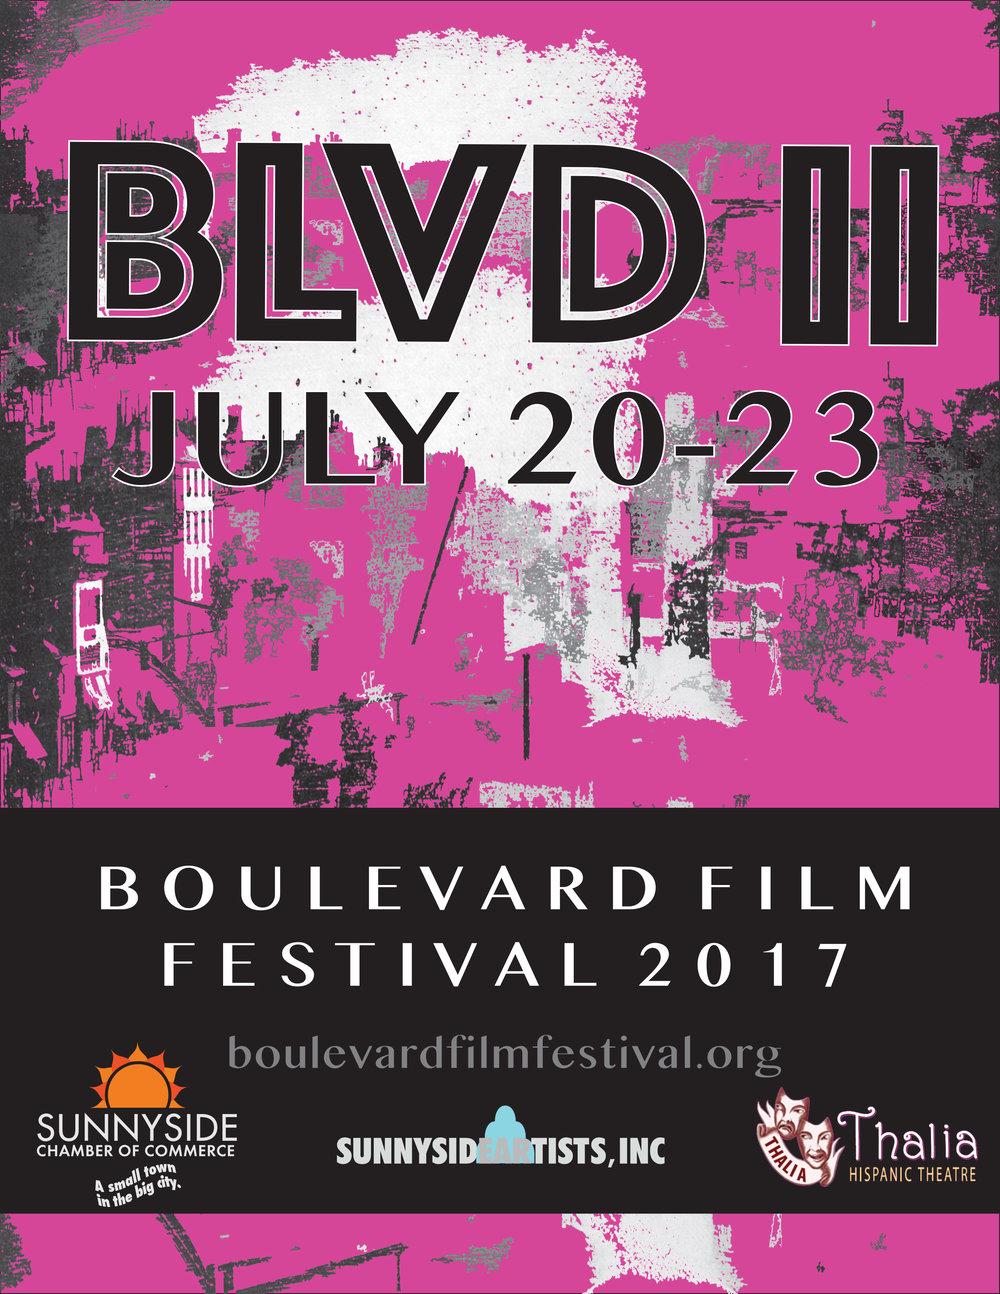 BLVD-FestivalPoster.jpg